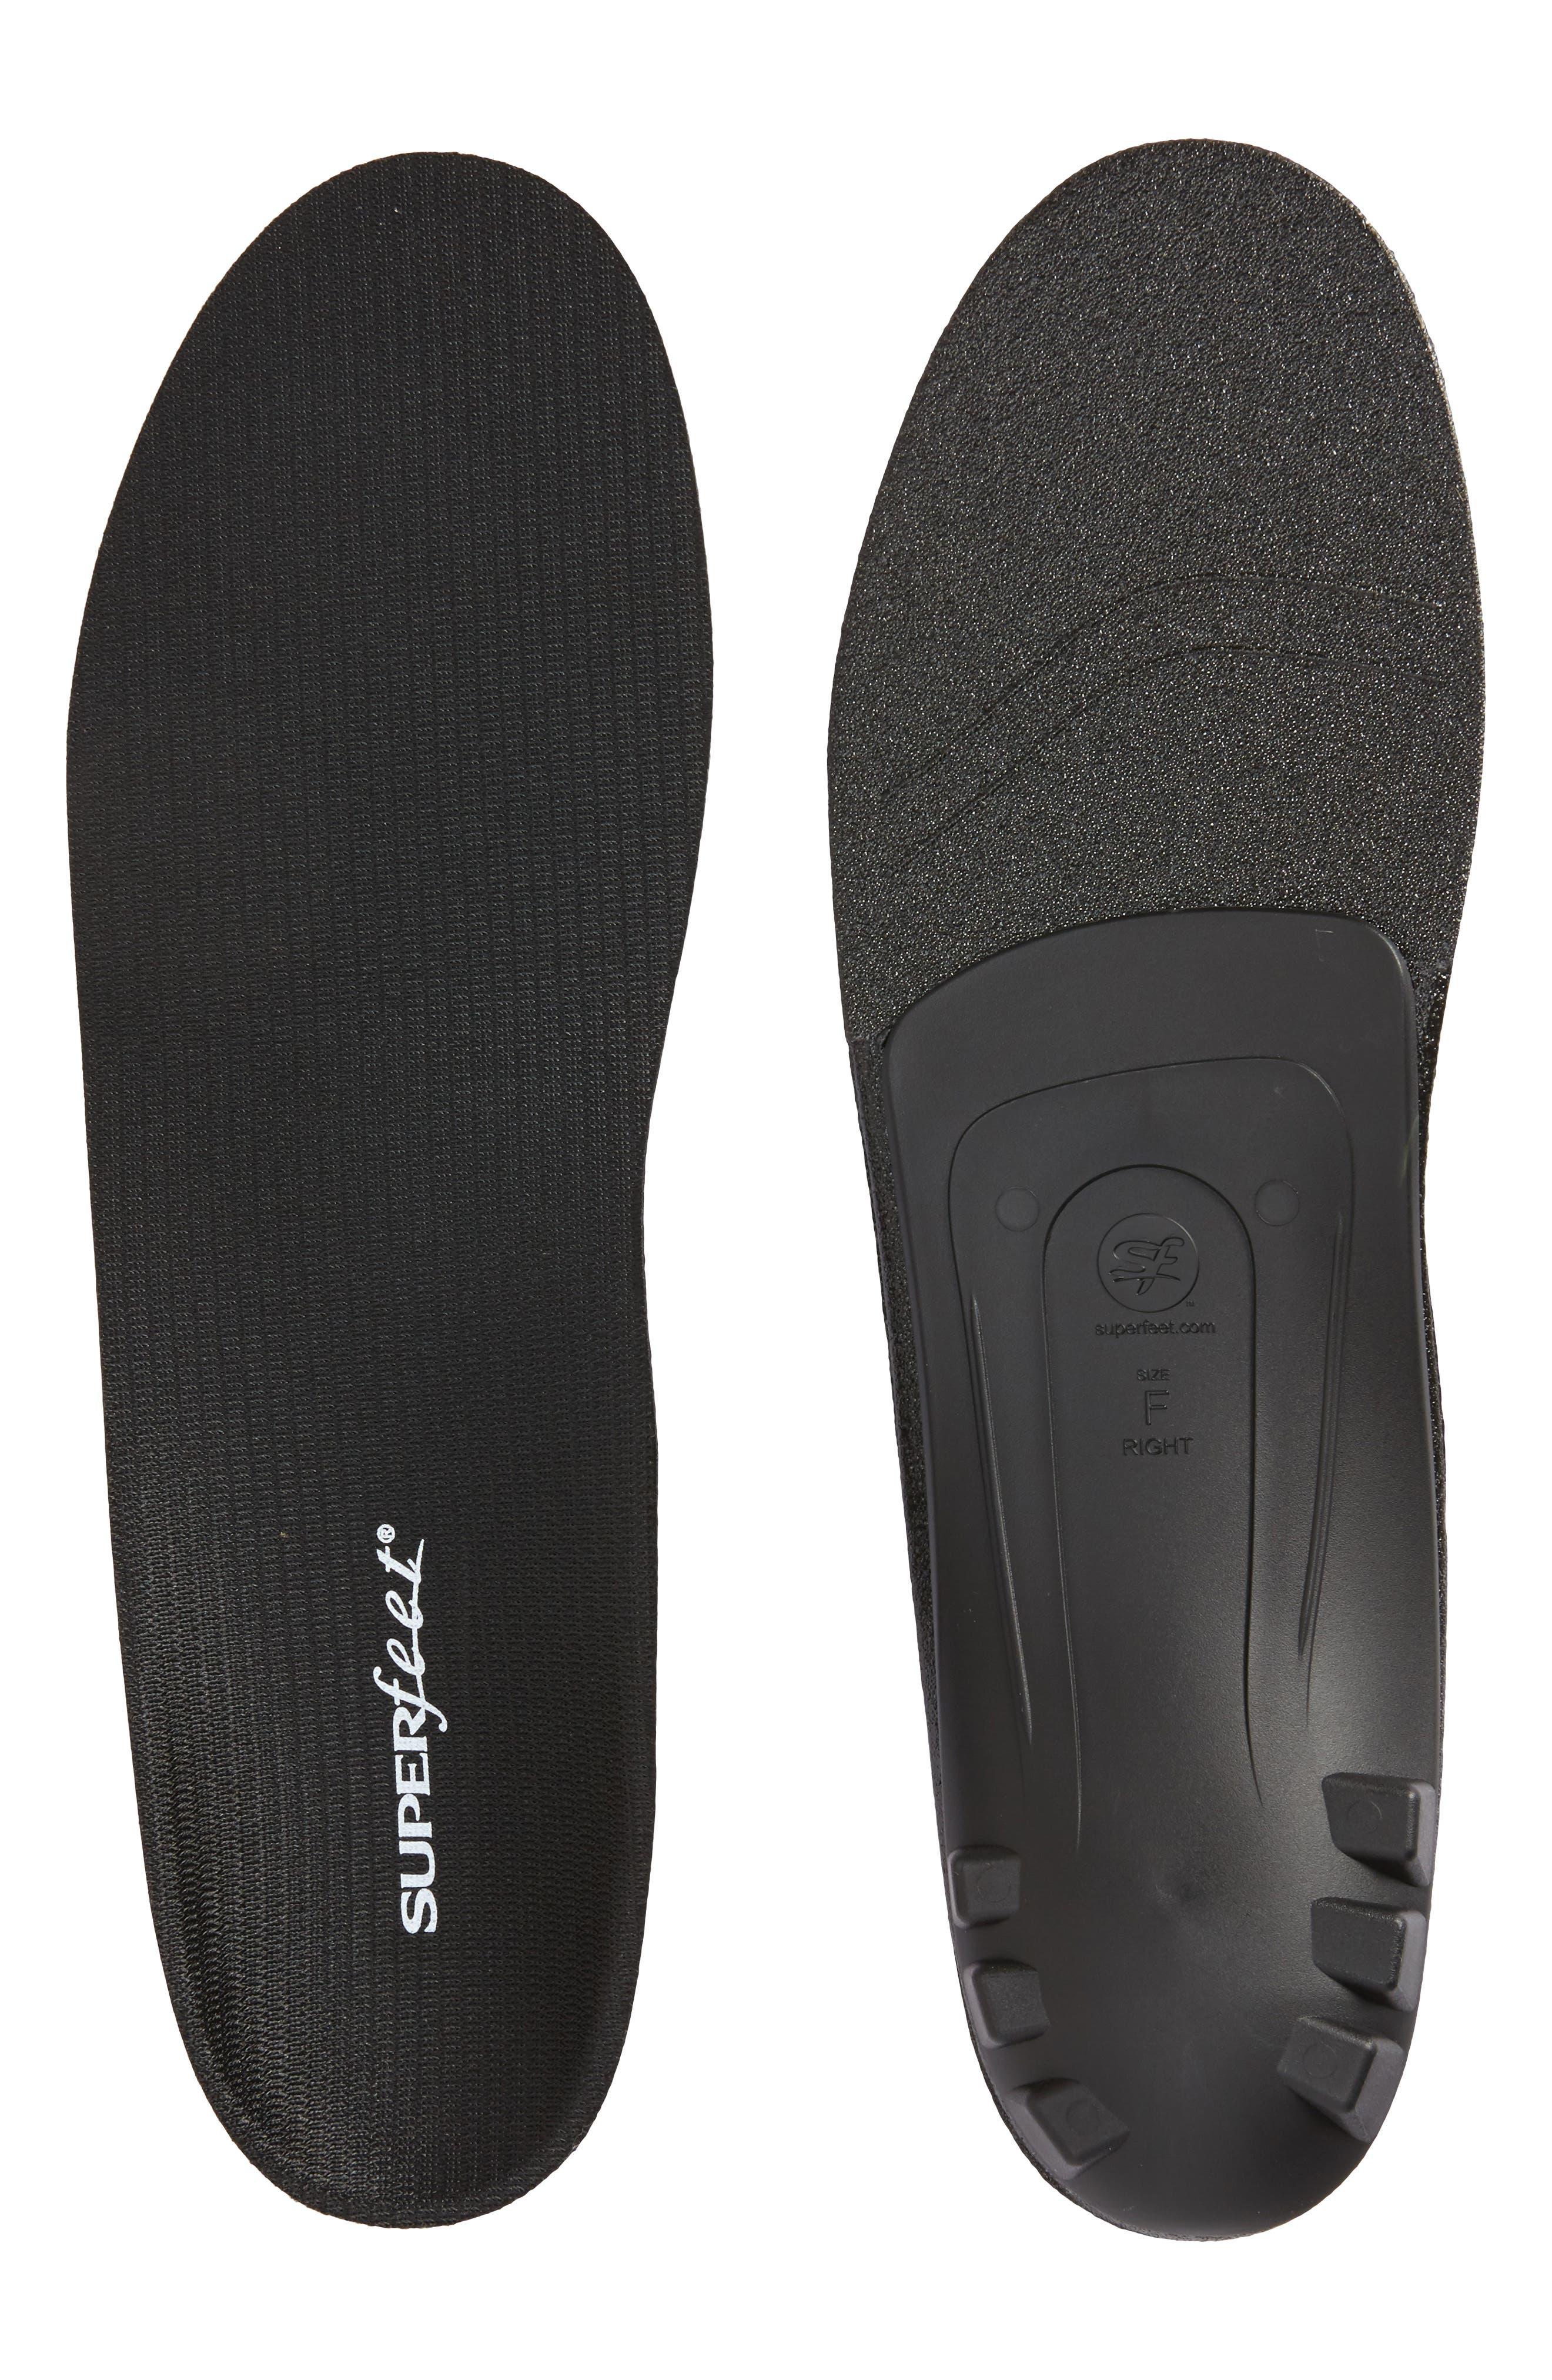 Dress Fit Black Full Length Insoles,                             Main thumbnail 1, color,                             BLACK